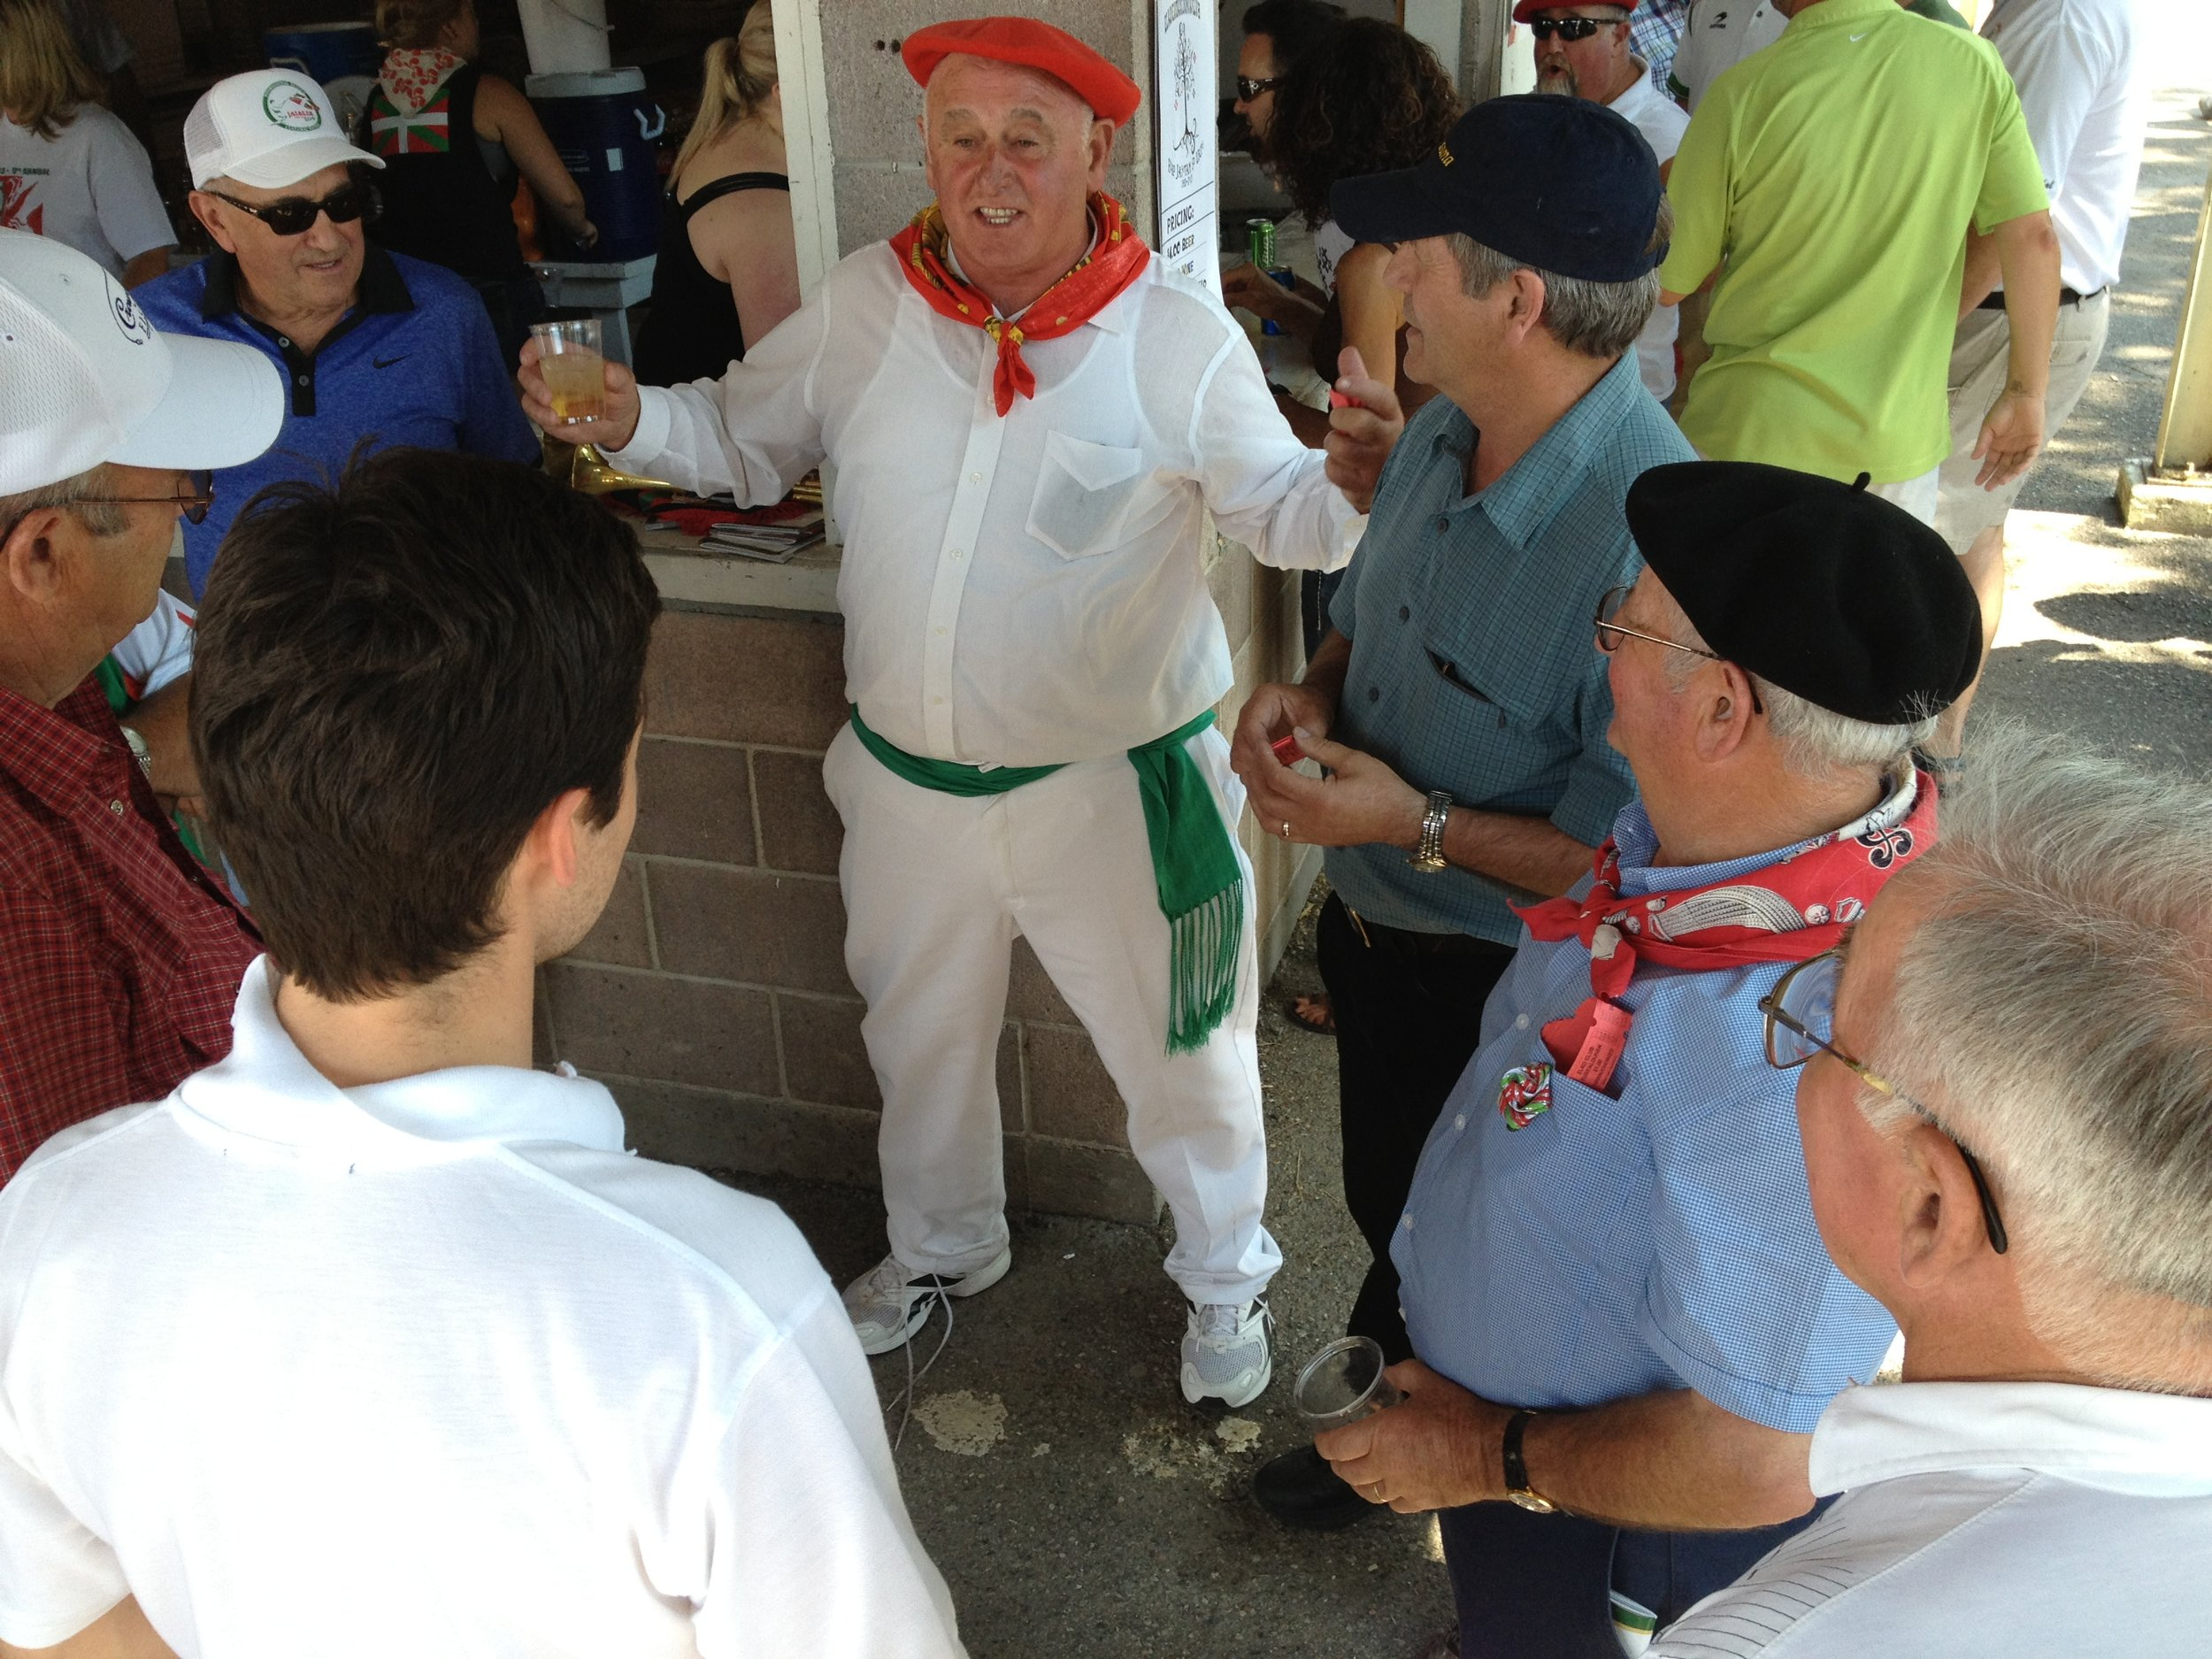 Bertsolaritza at the National Basque Festival, Elko, Nevada. Photo by Meg Glaser